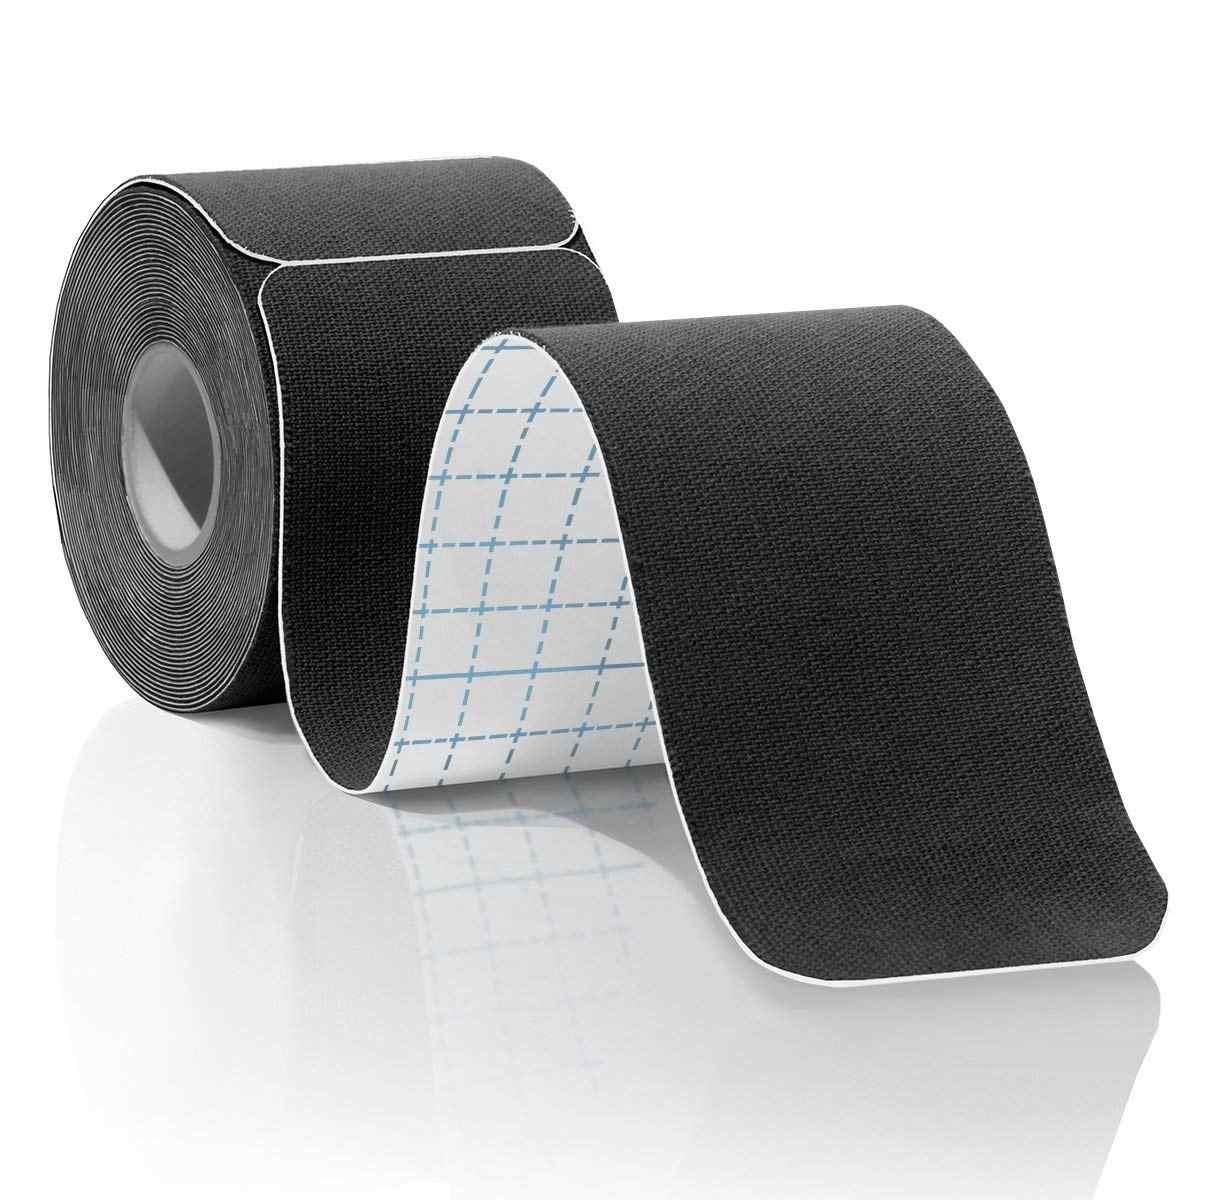 1pc プレカット/包茎キネシオロジーテープおっぱいテープ筋肉痛緩和フィットネス通気性防水スポーツ治療粘着テープ